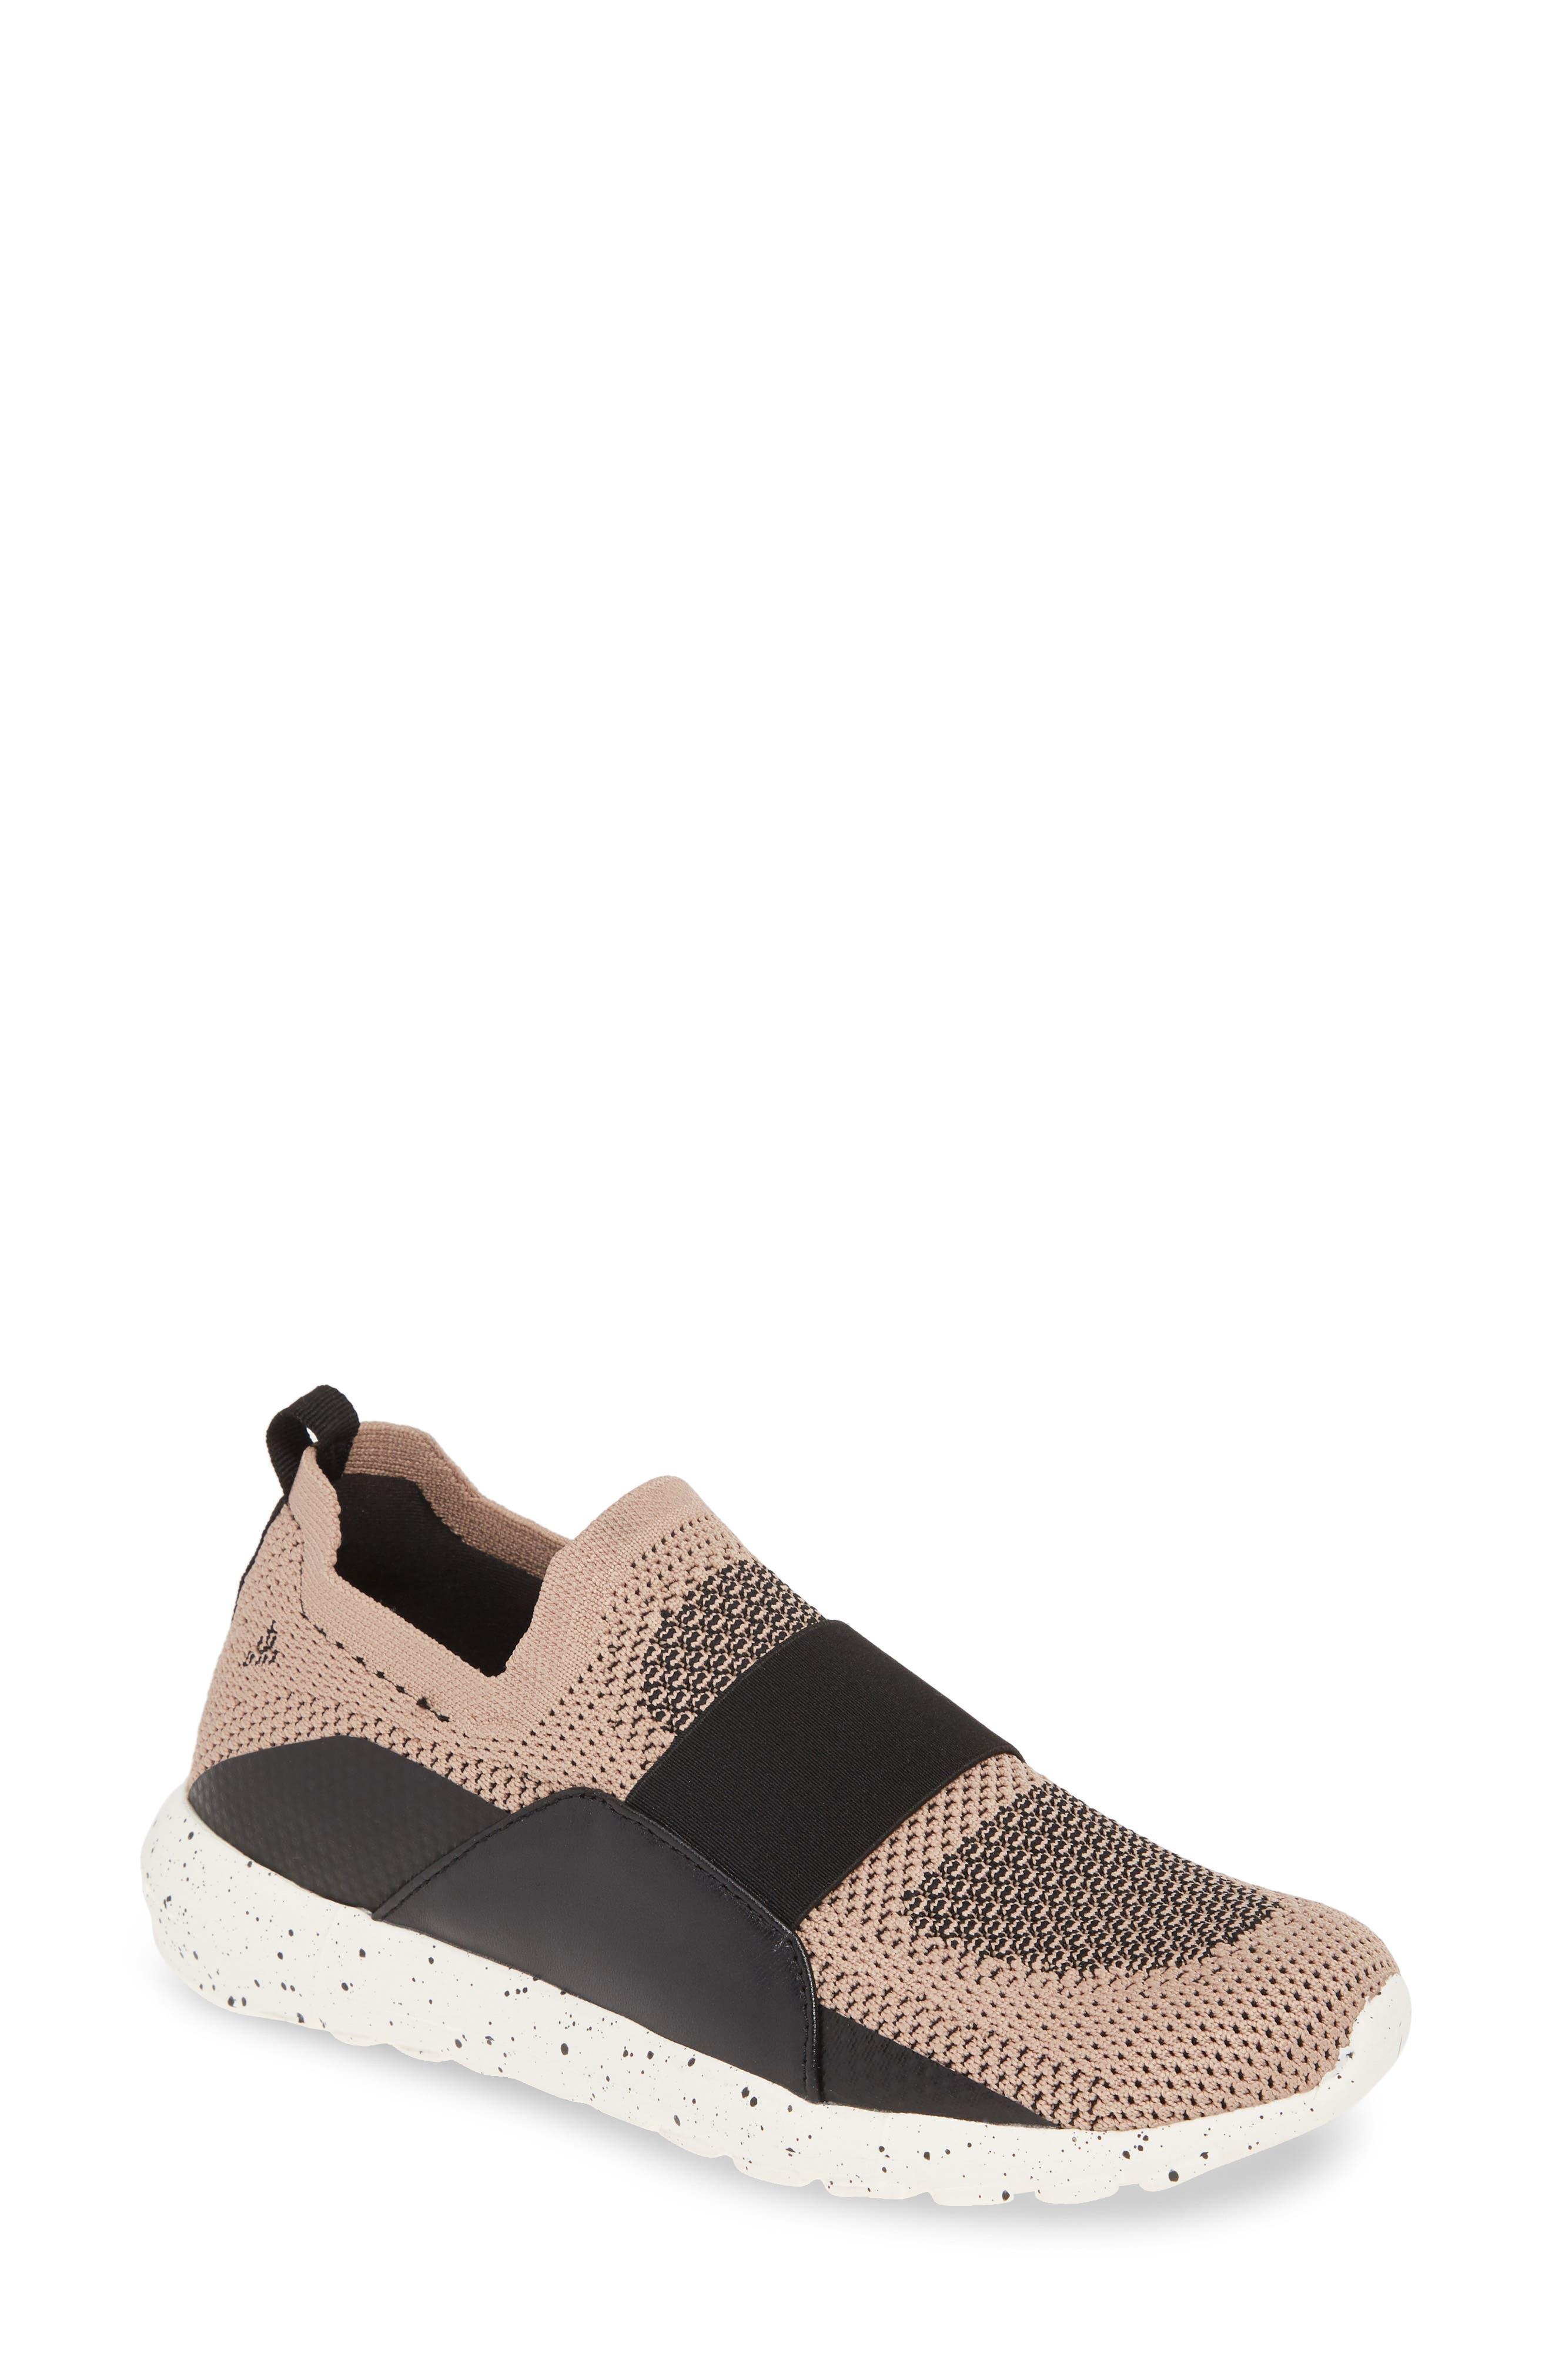 Bernie Mev. Asako Slip-On Sneaker, Pink